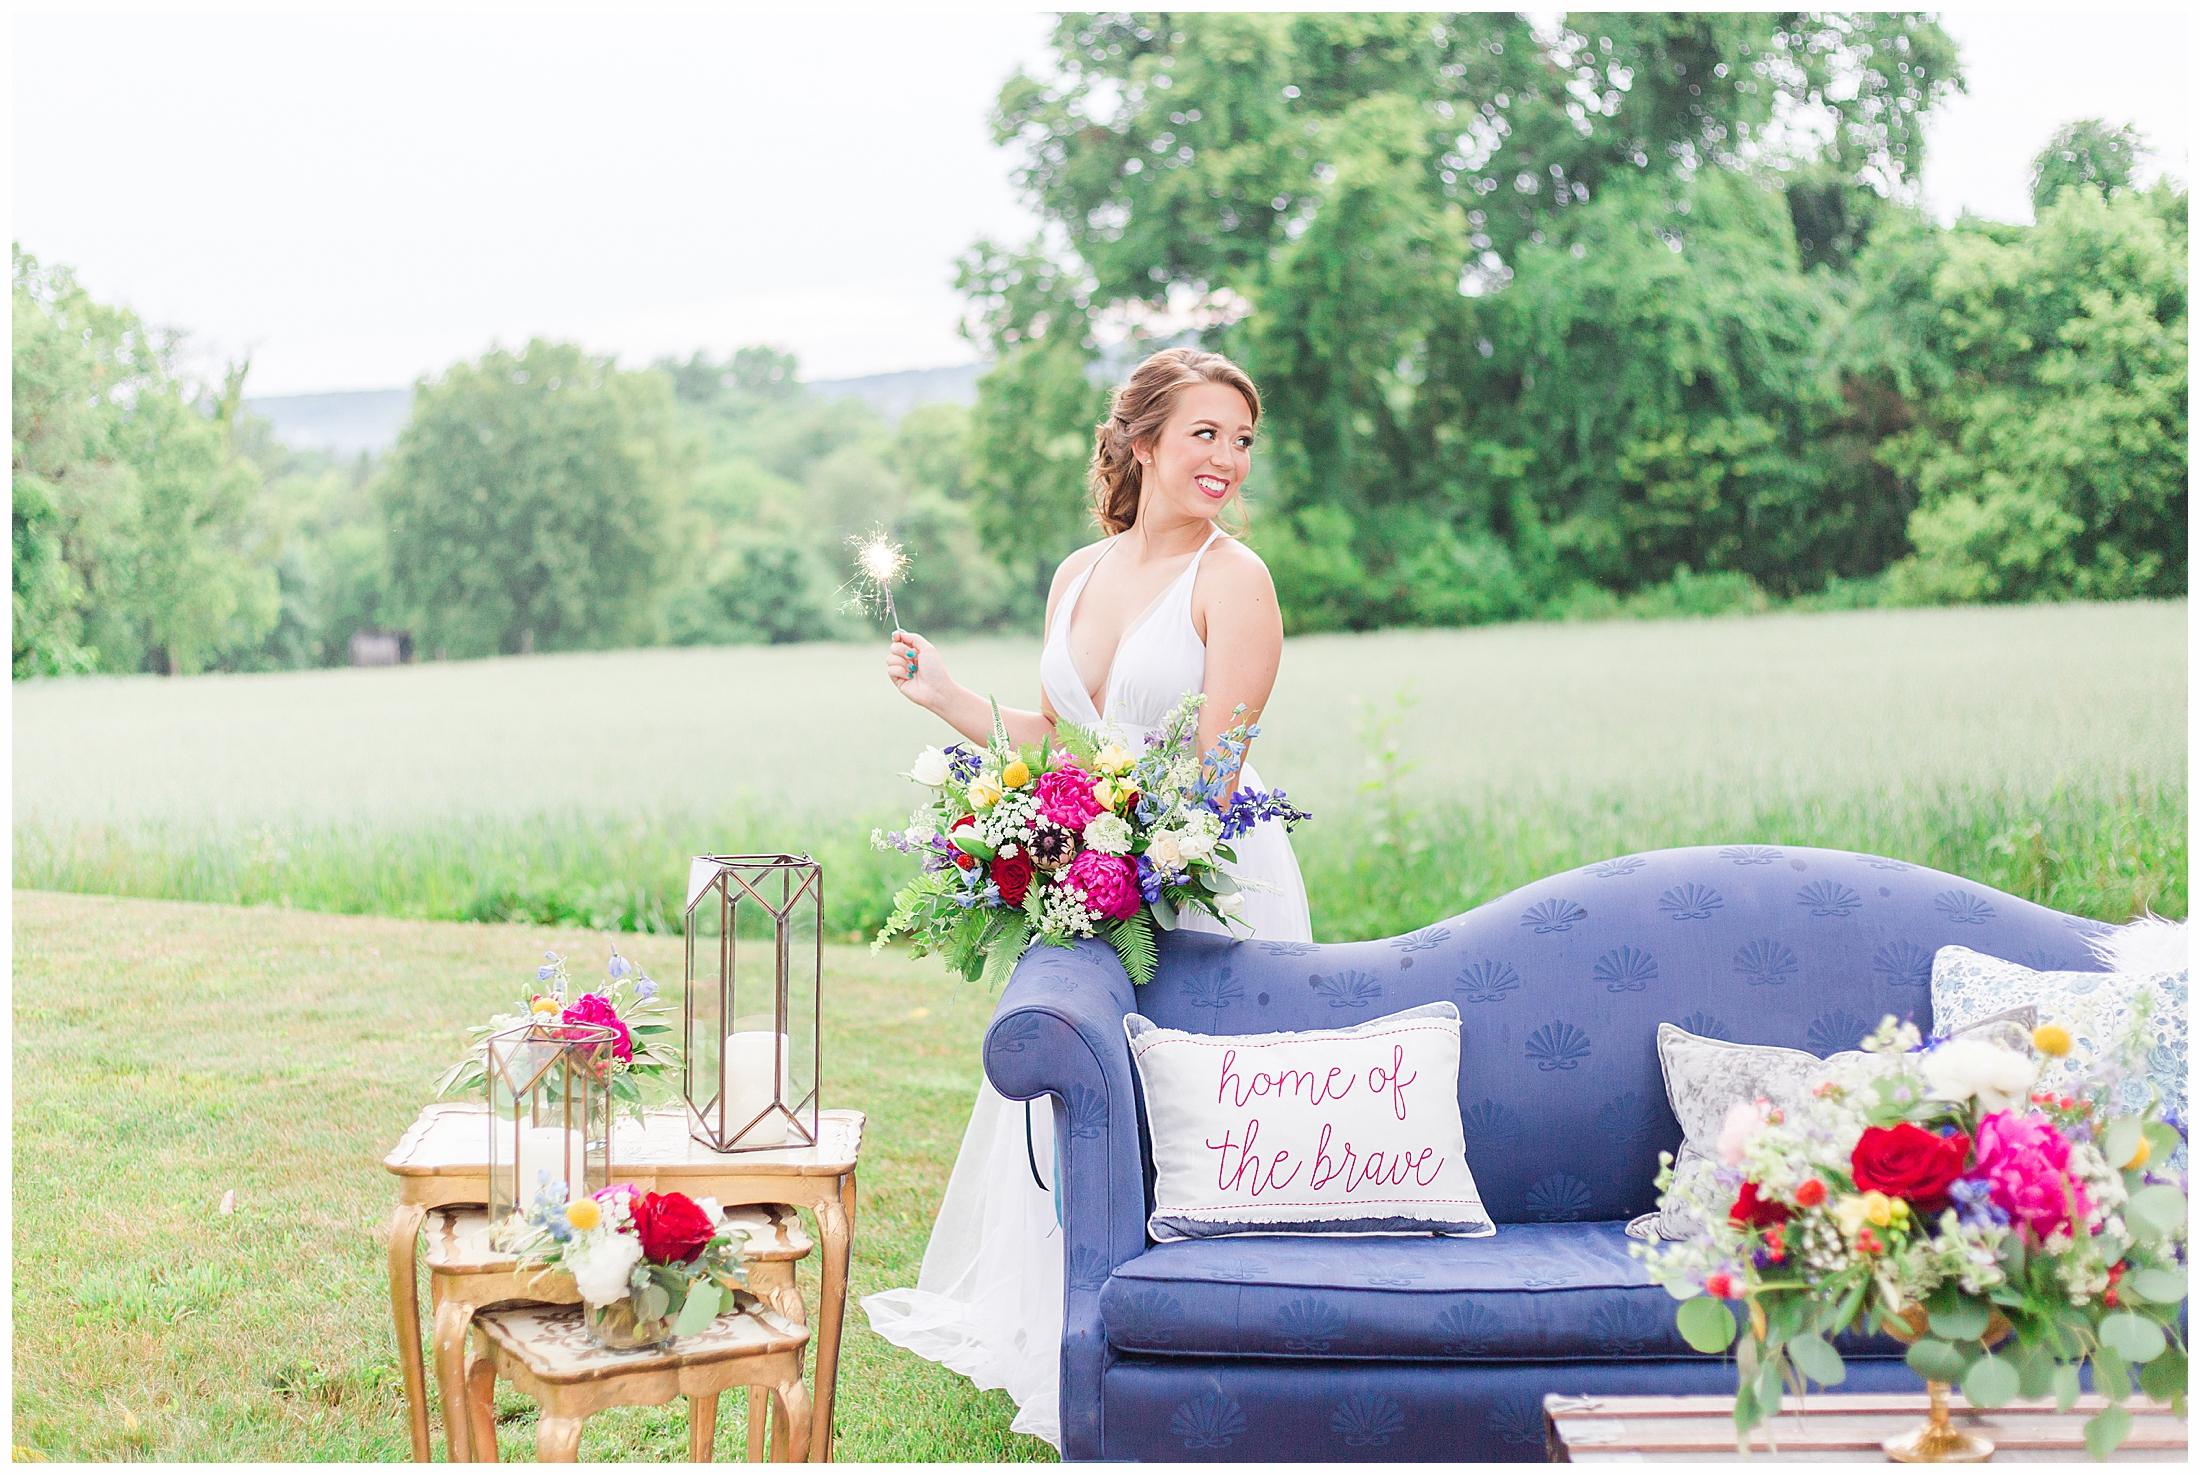 colorful-americana-wedding-shoot_0001.jpg